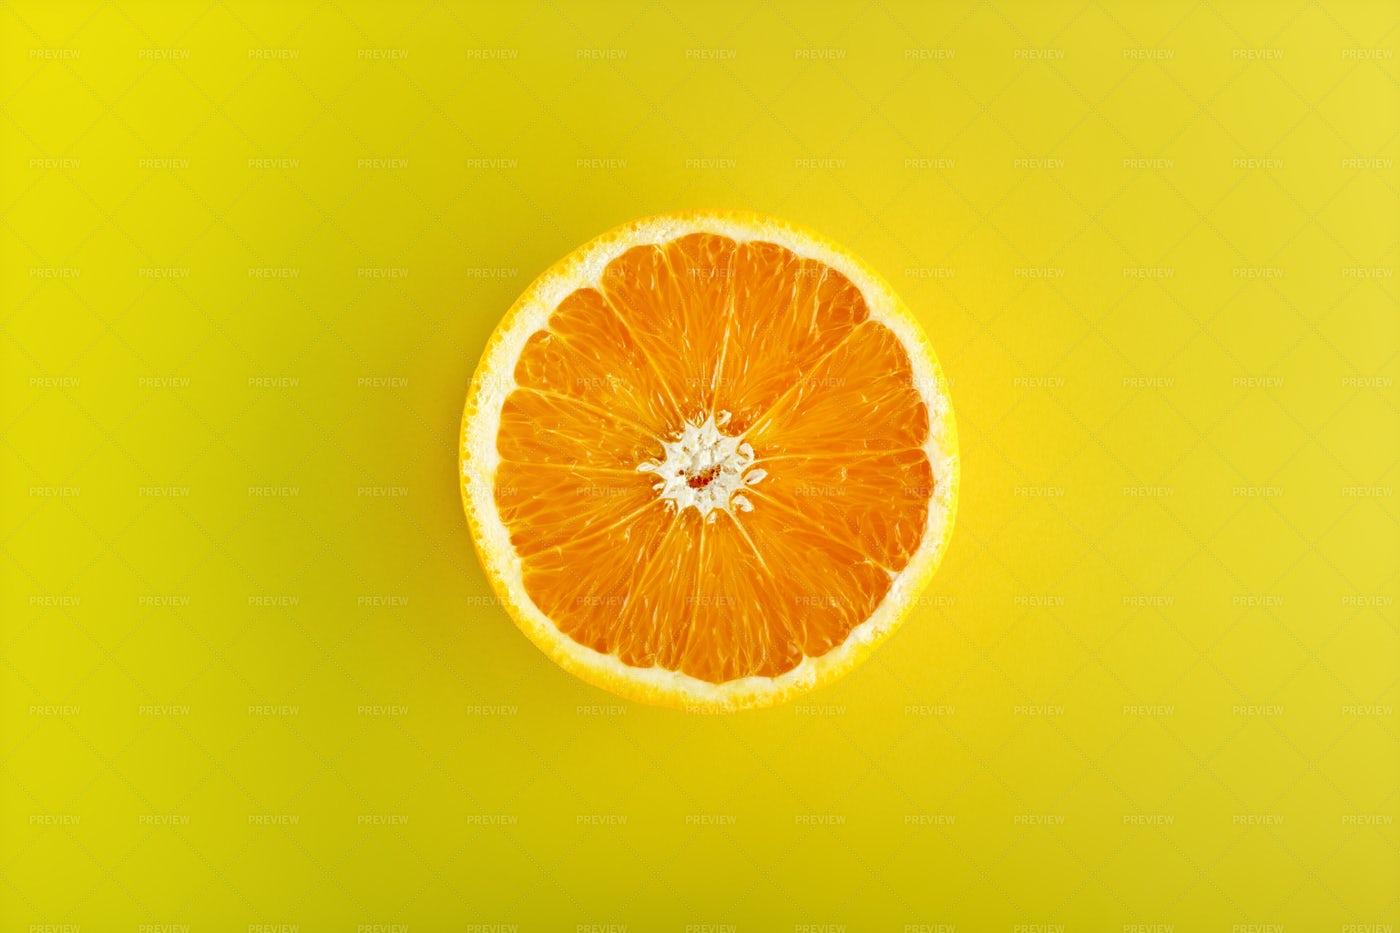 Orange Half On Yellow: Stock Photos